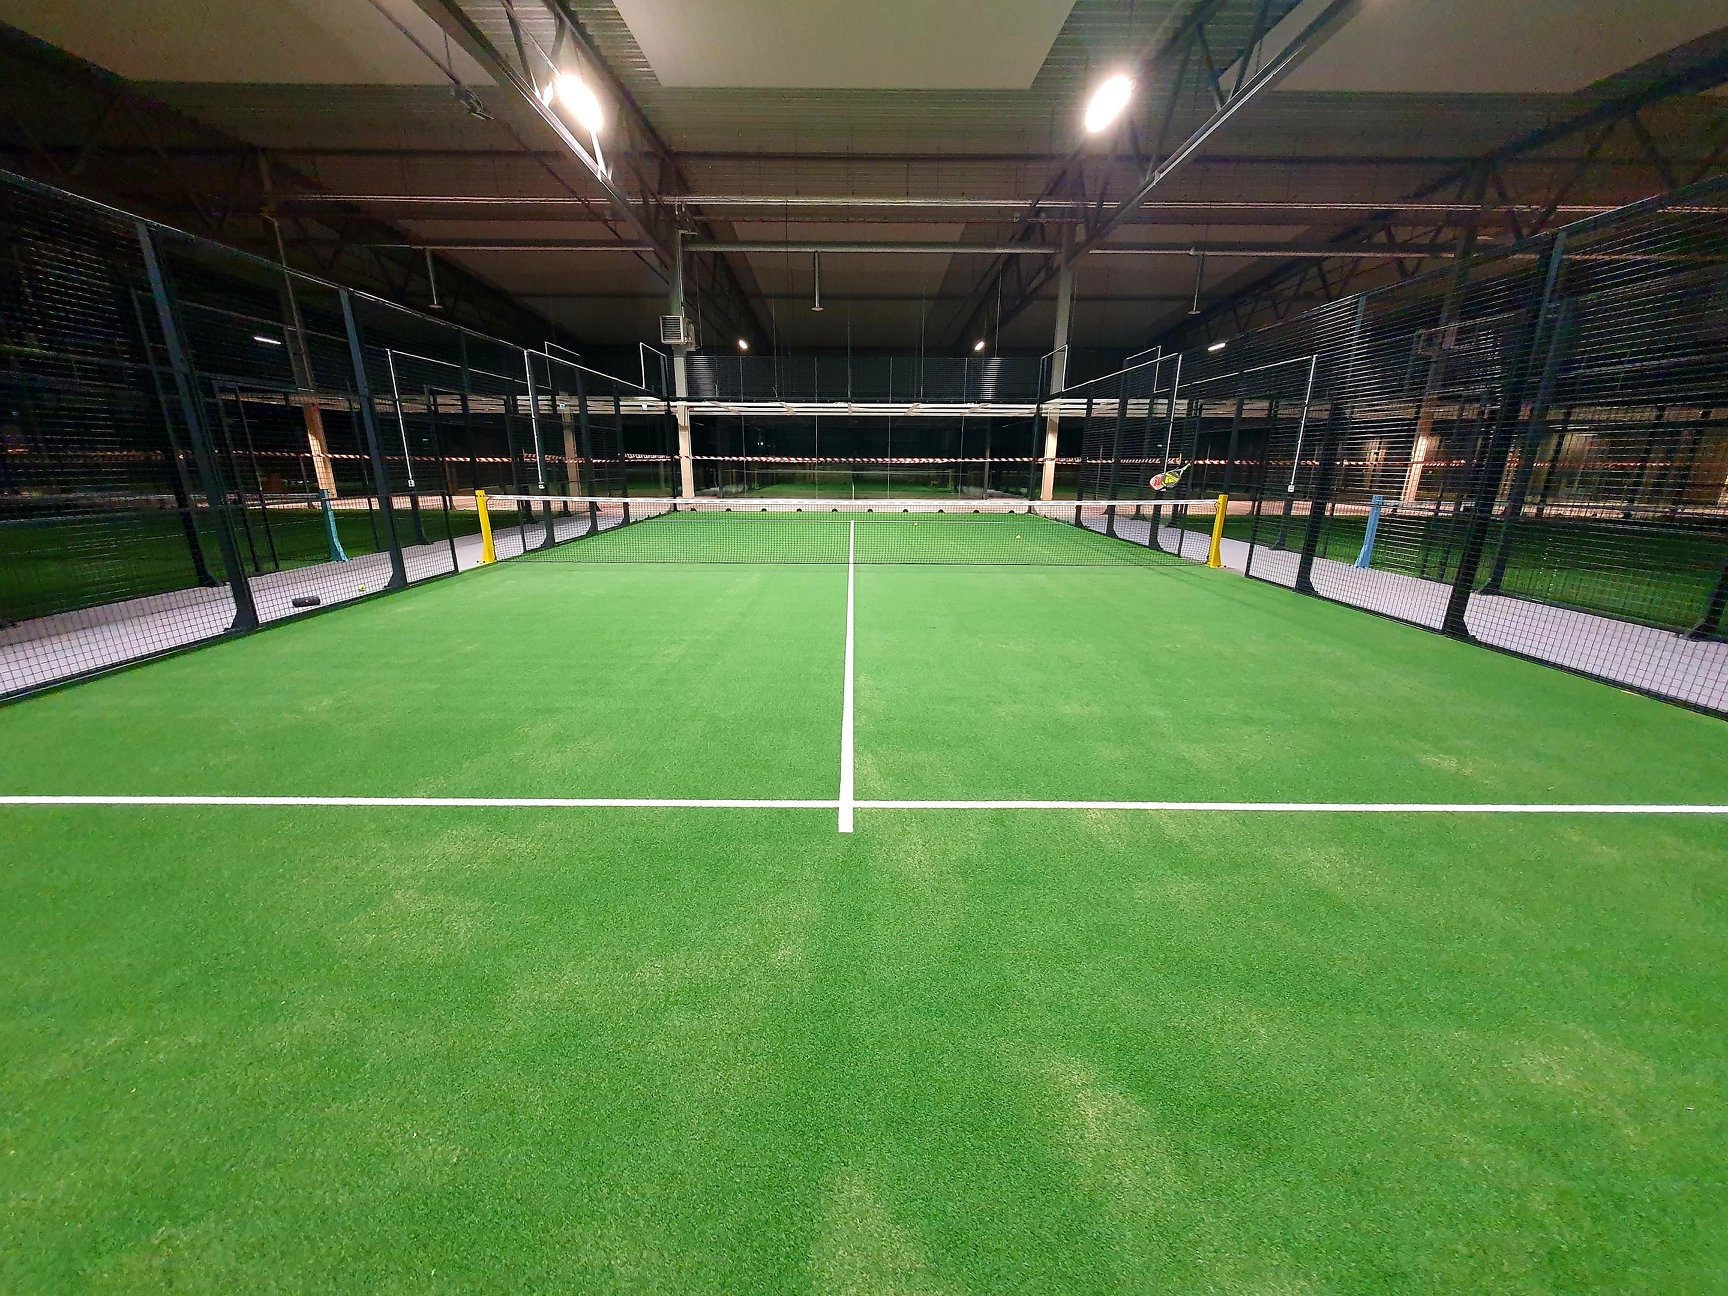 birsta padelcenter padelhall padel padelbanor unisport